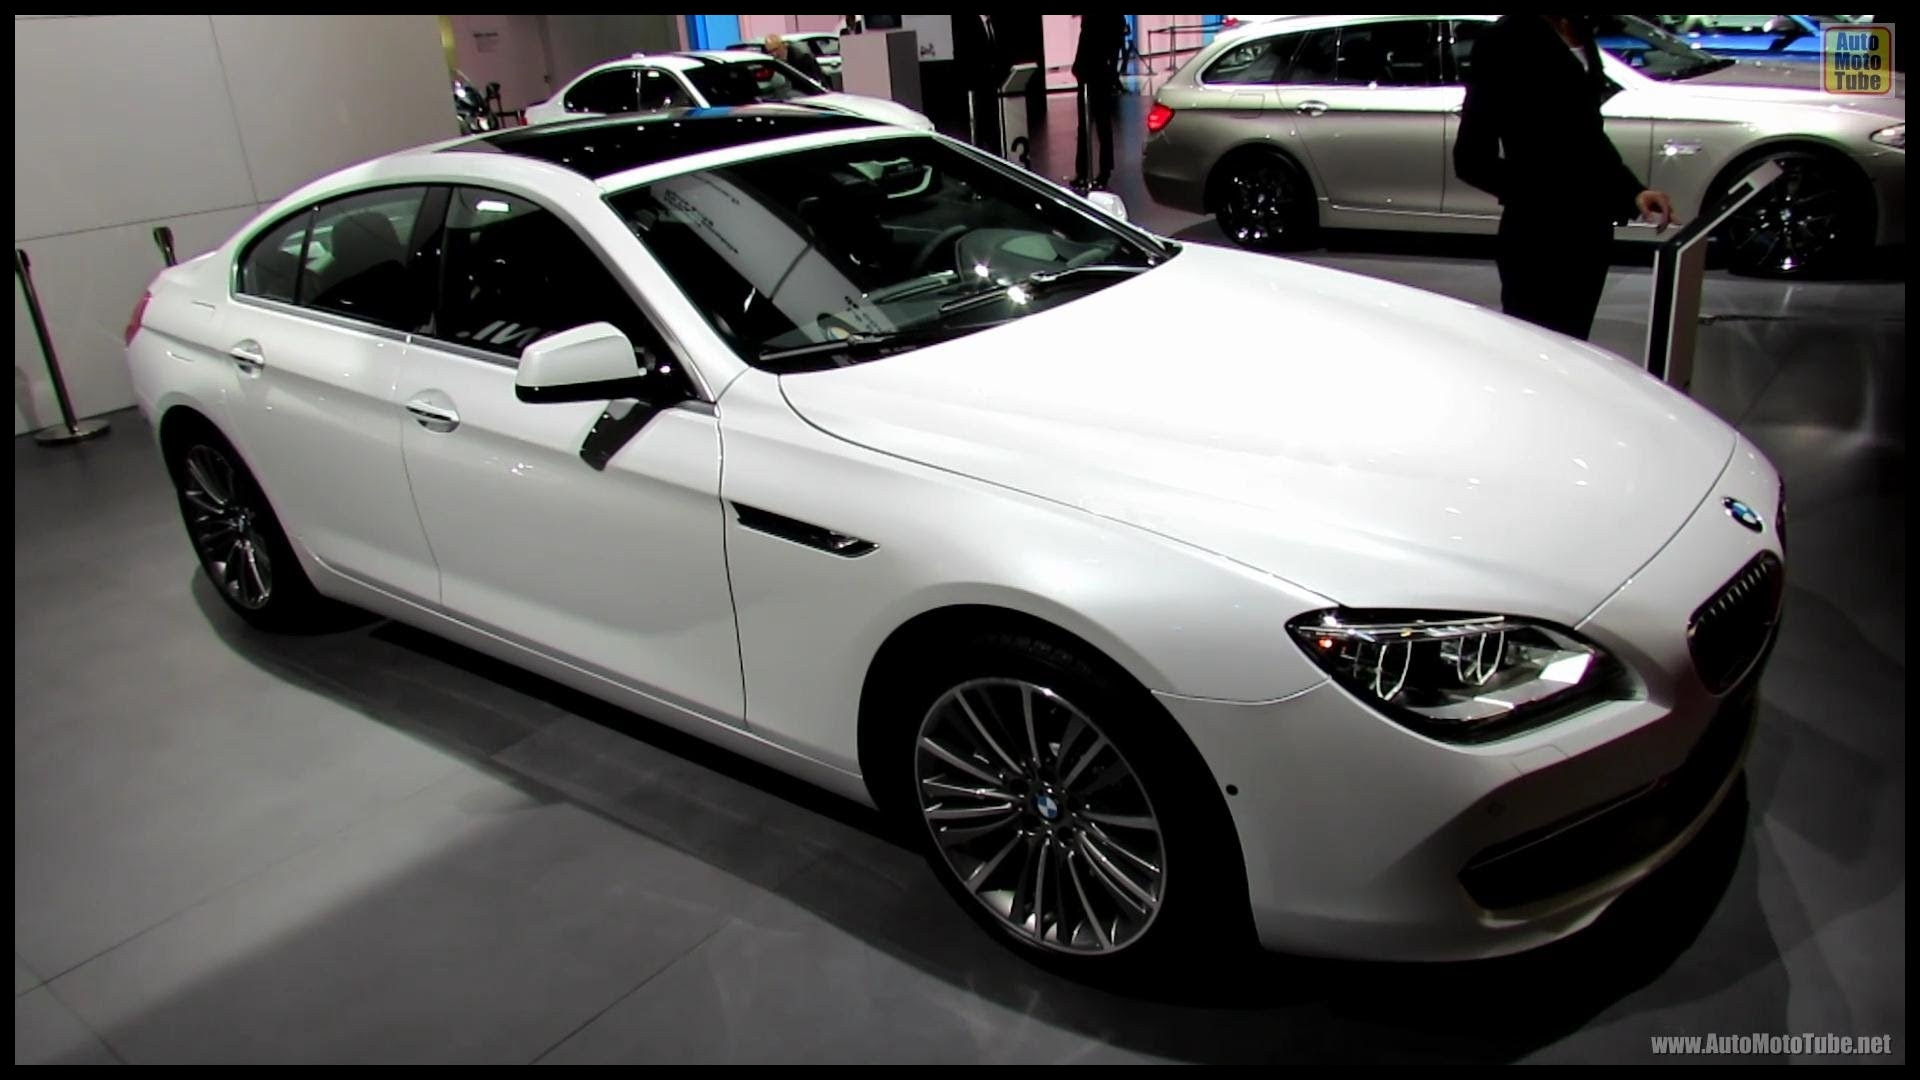 Bmw 650i Spec Elegant 2013 Bmw 650i Xdrive Gran Coupe Exterior and Interior Walkaround